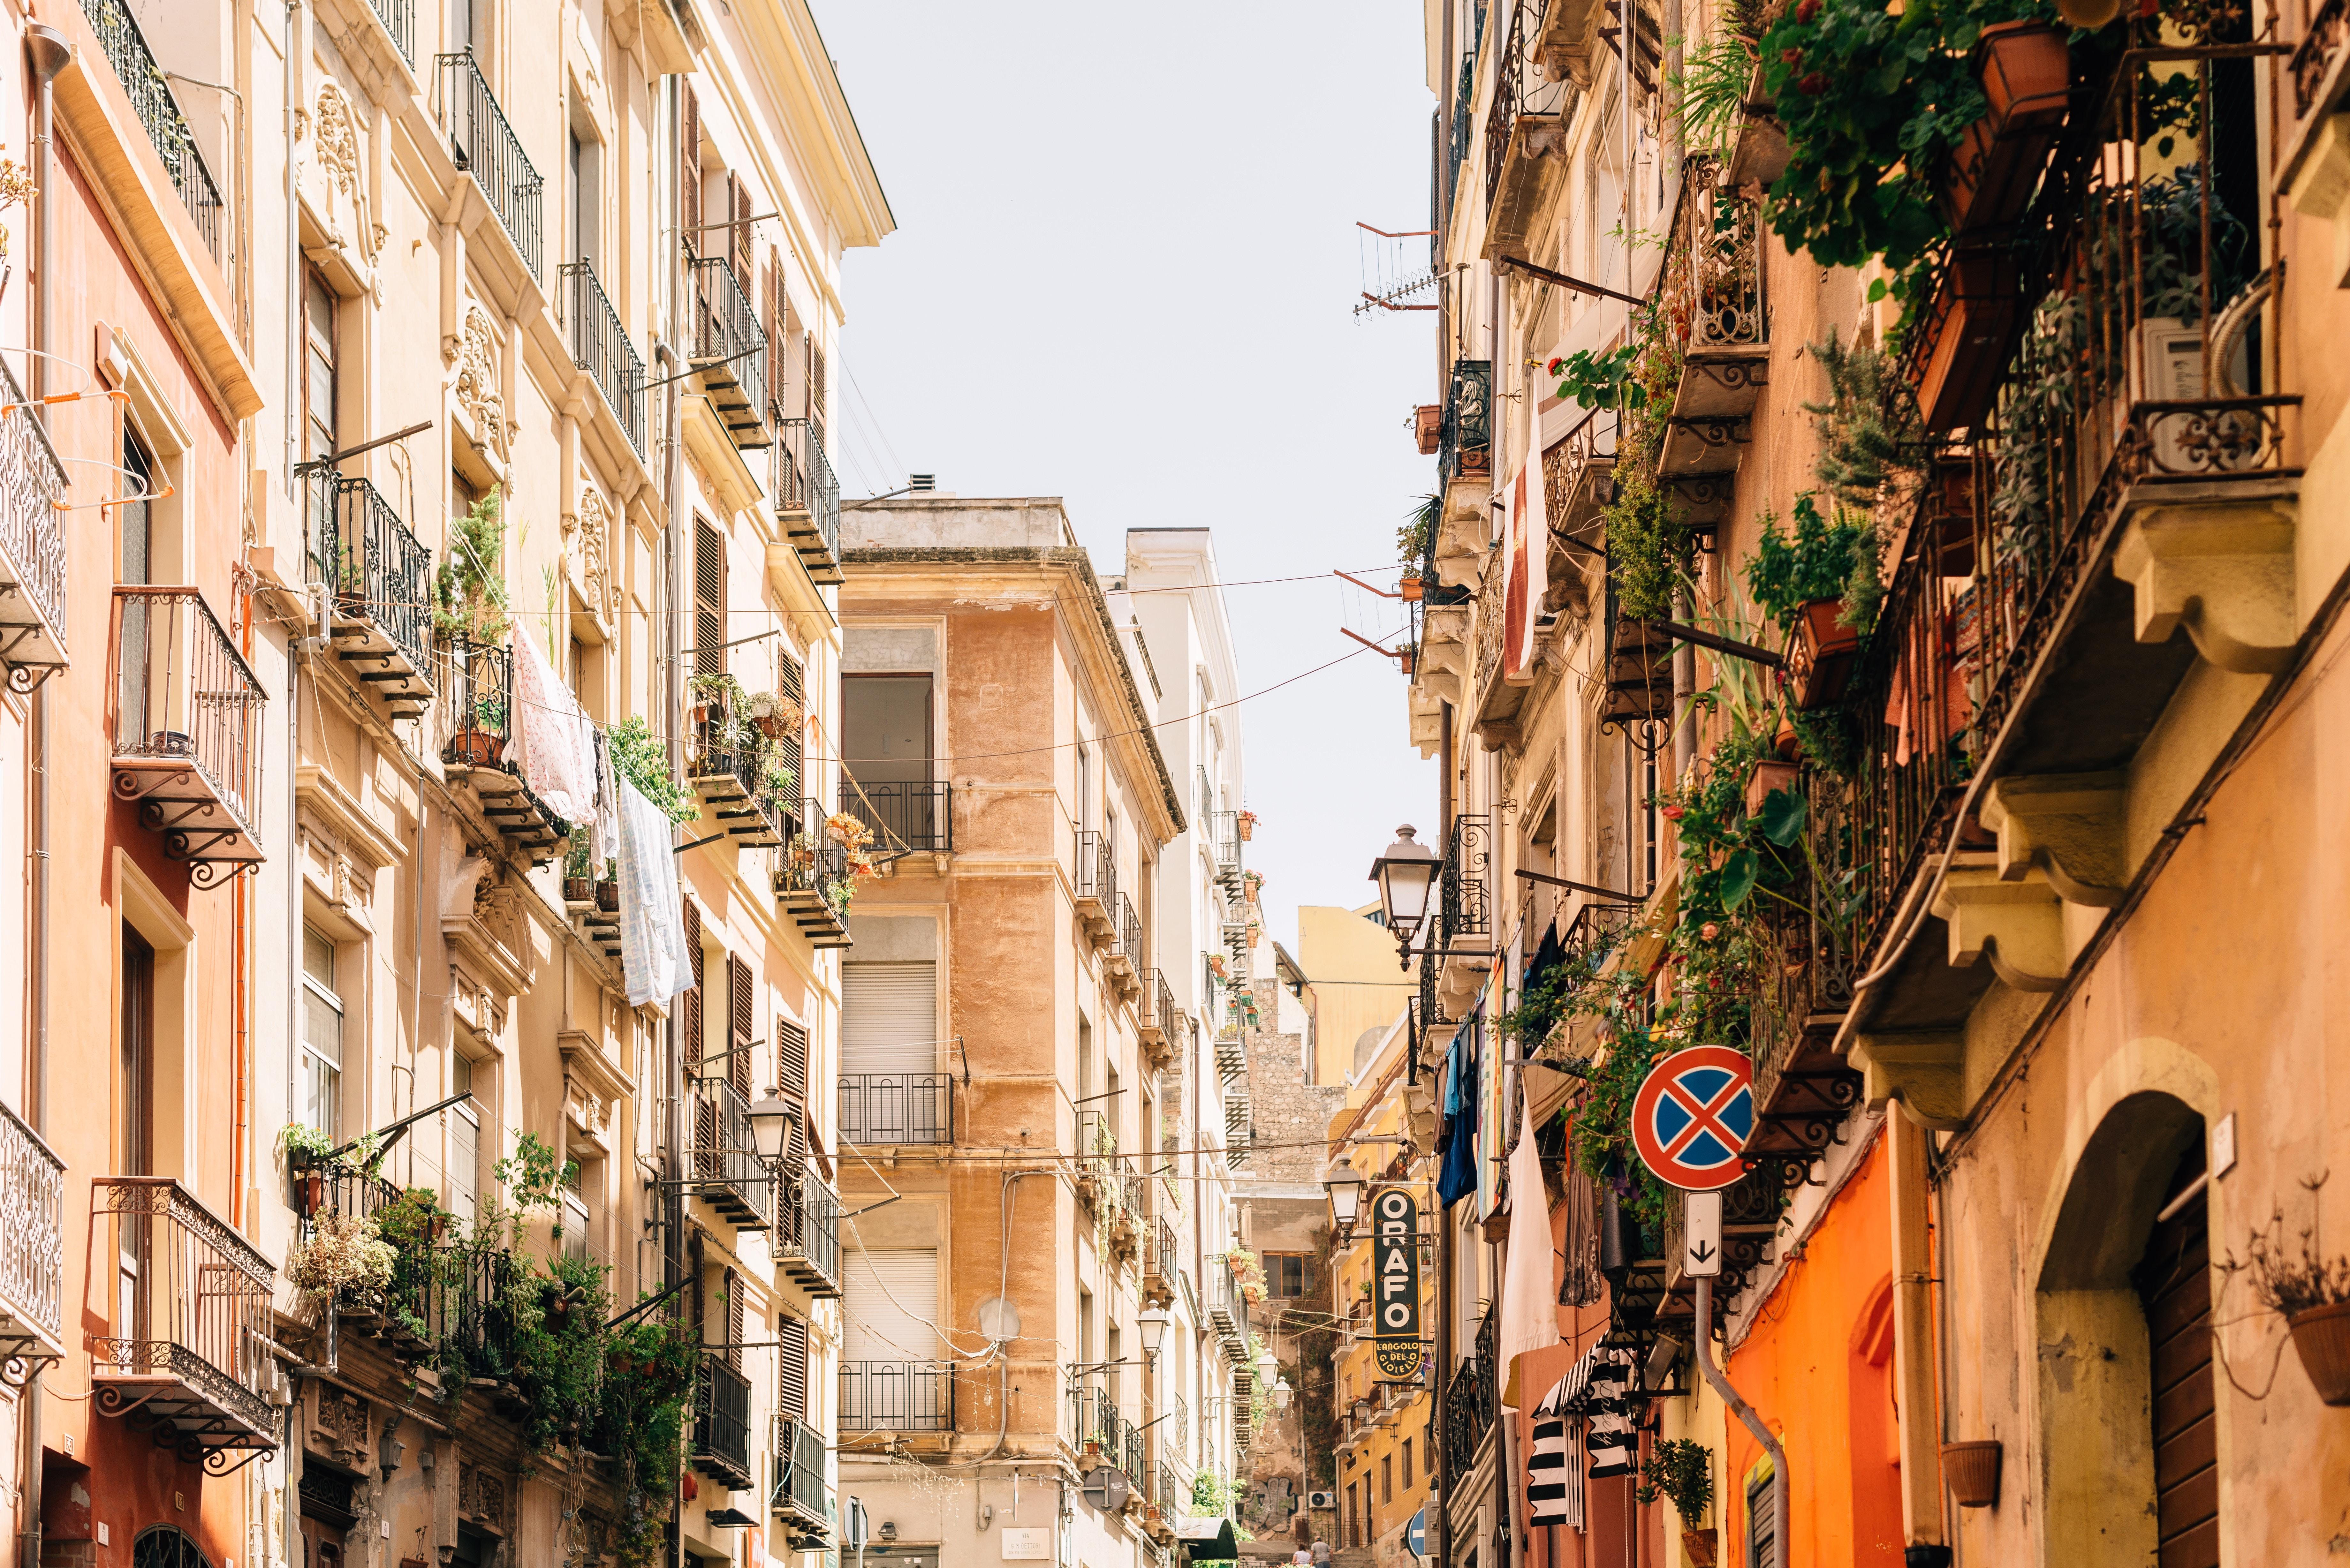 A busy street in Cagliari